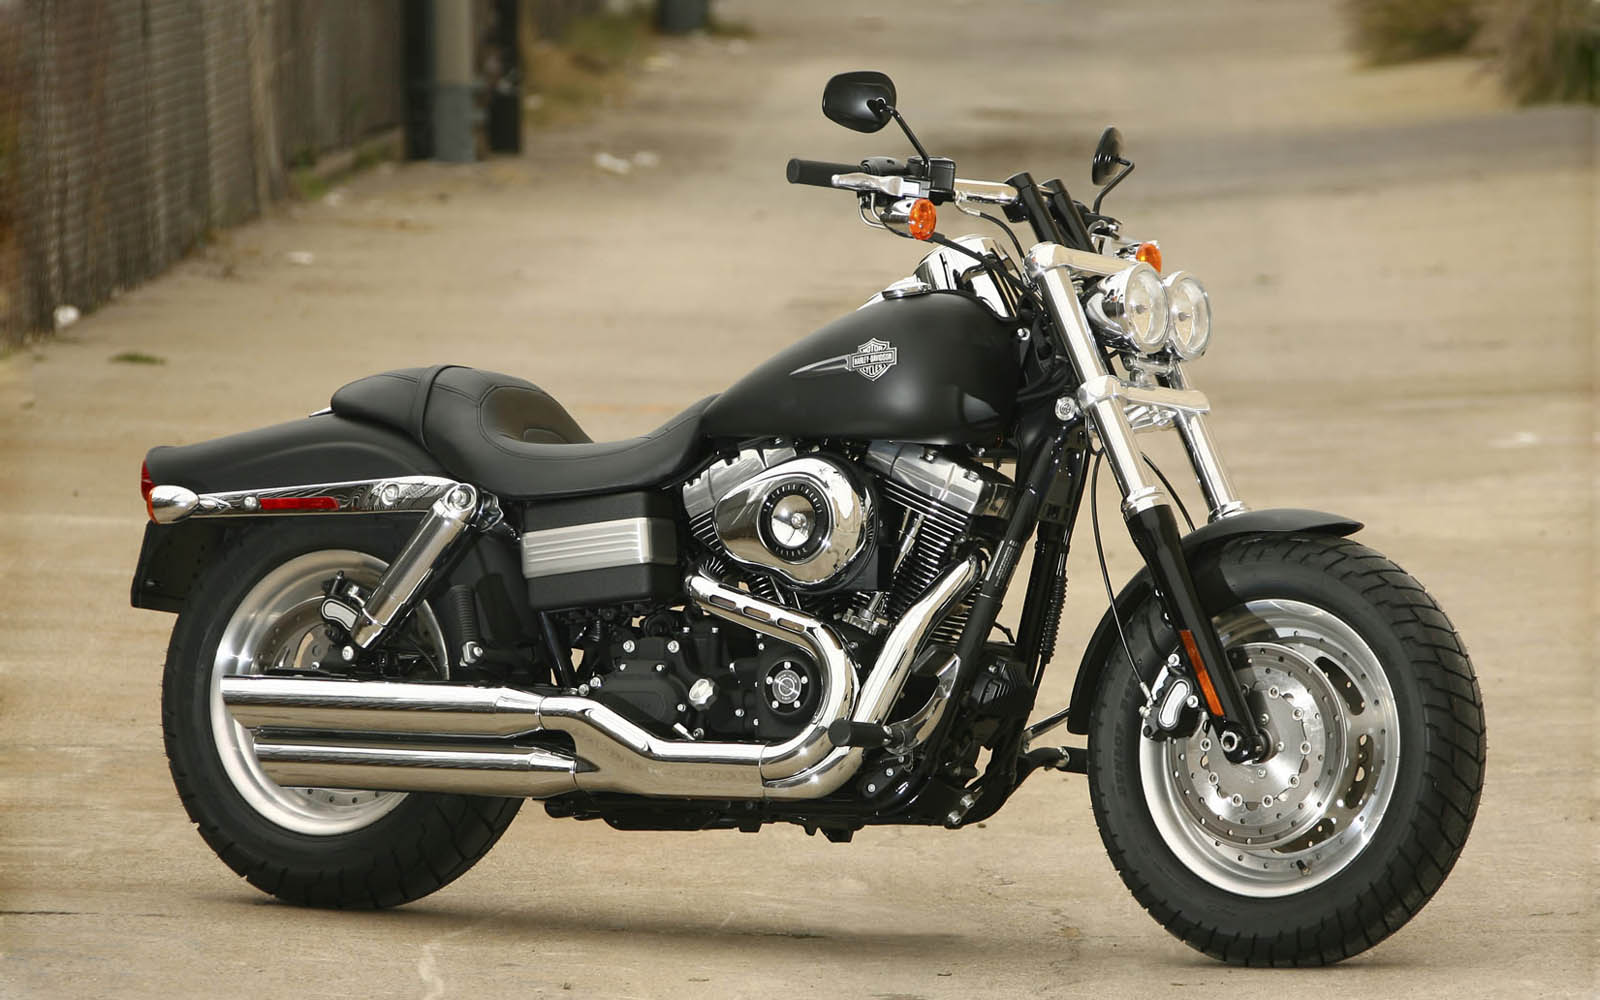 Wallpapers Harley Davidson Bikes Download